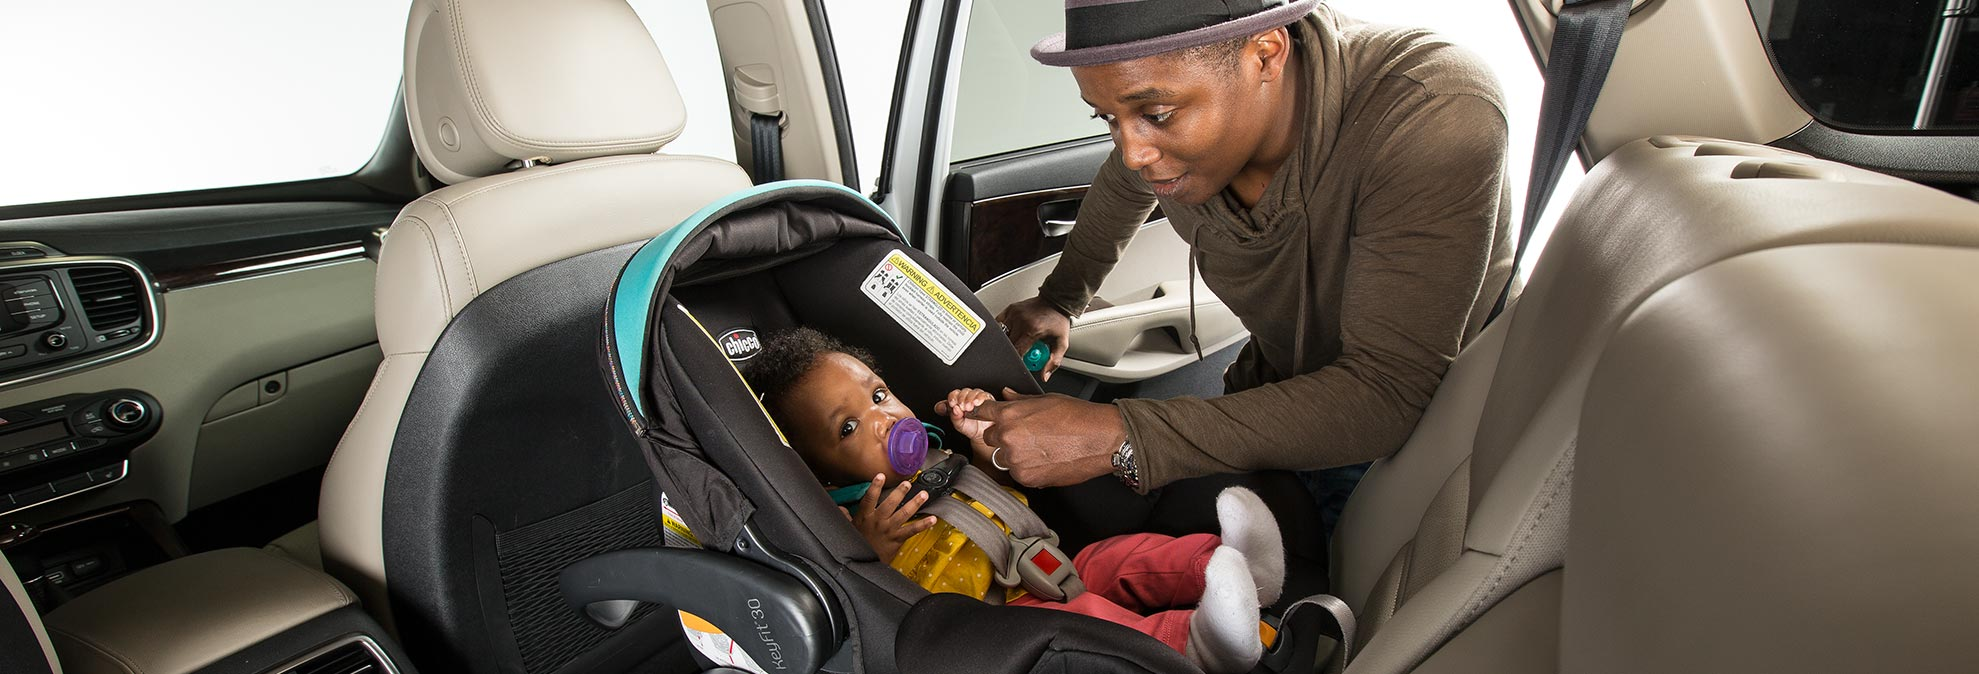 Best Infant Car Seats Consumer Reports